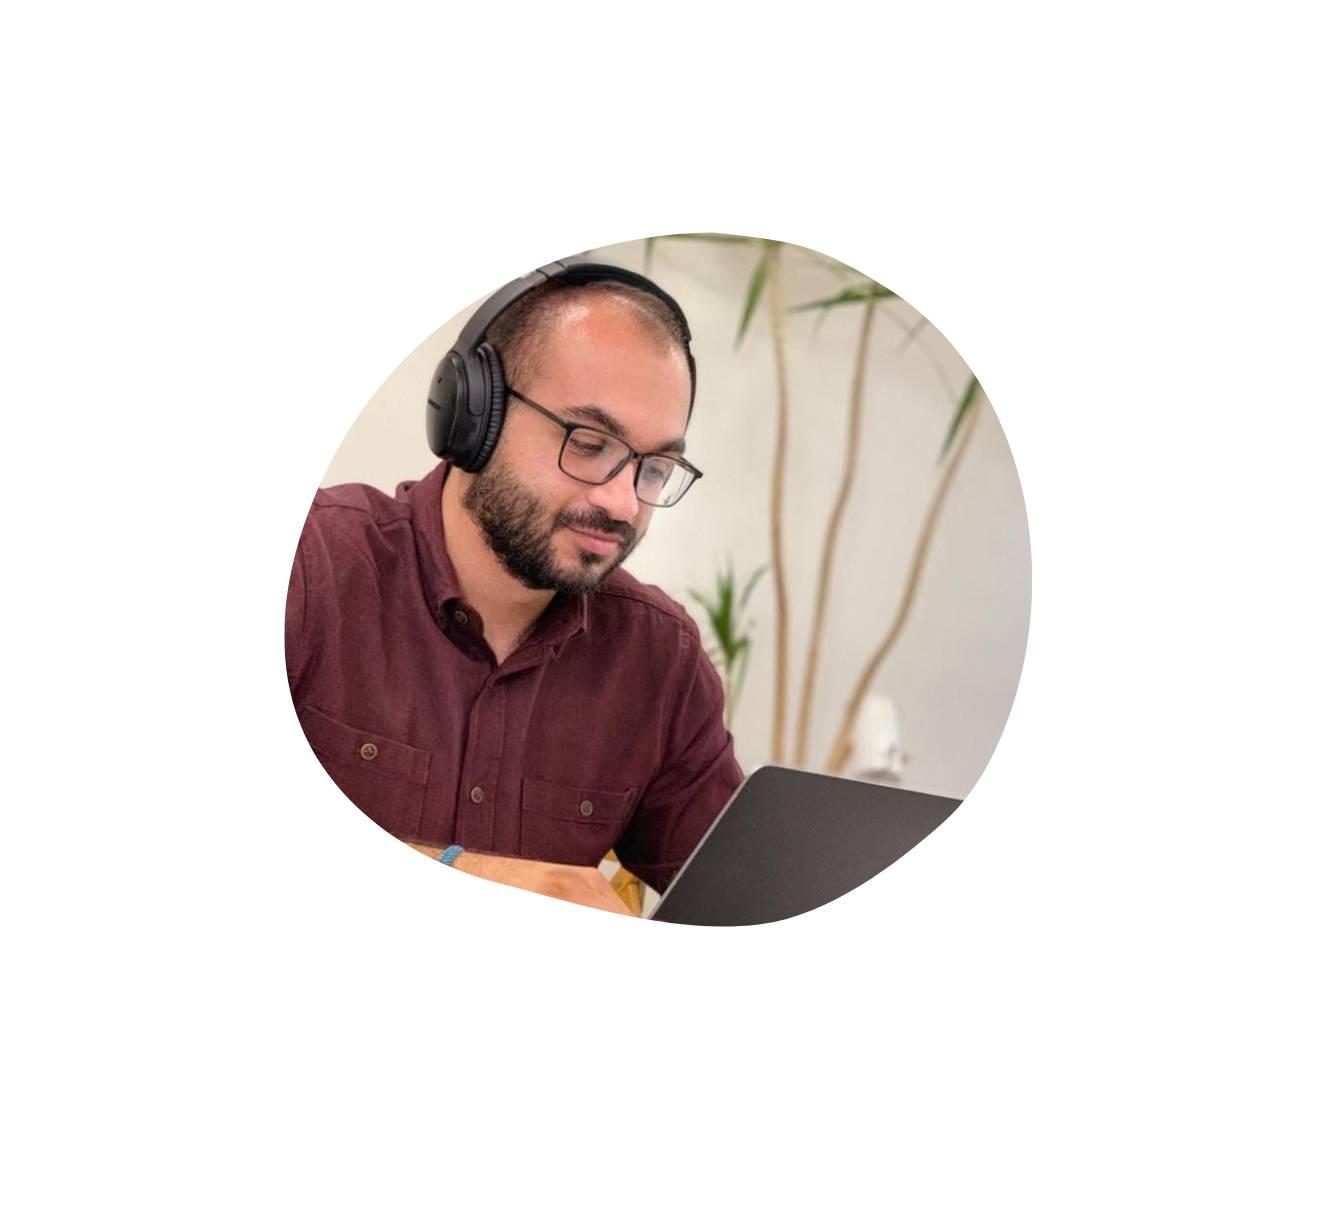 Moe - Digital marketing consultant working